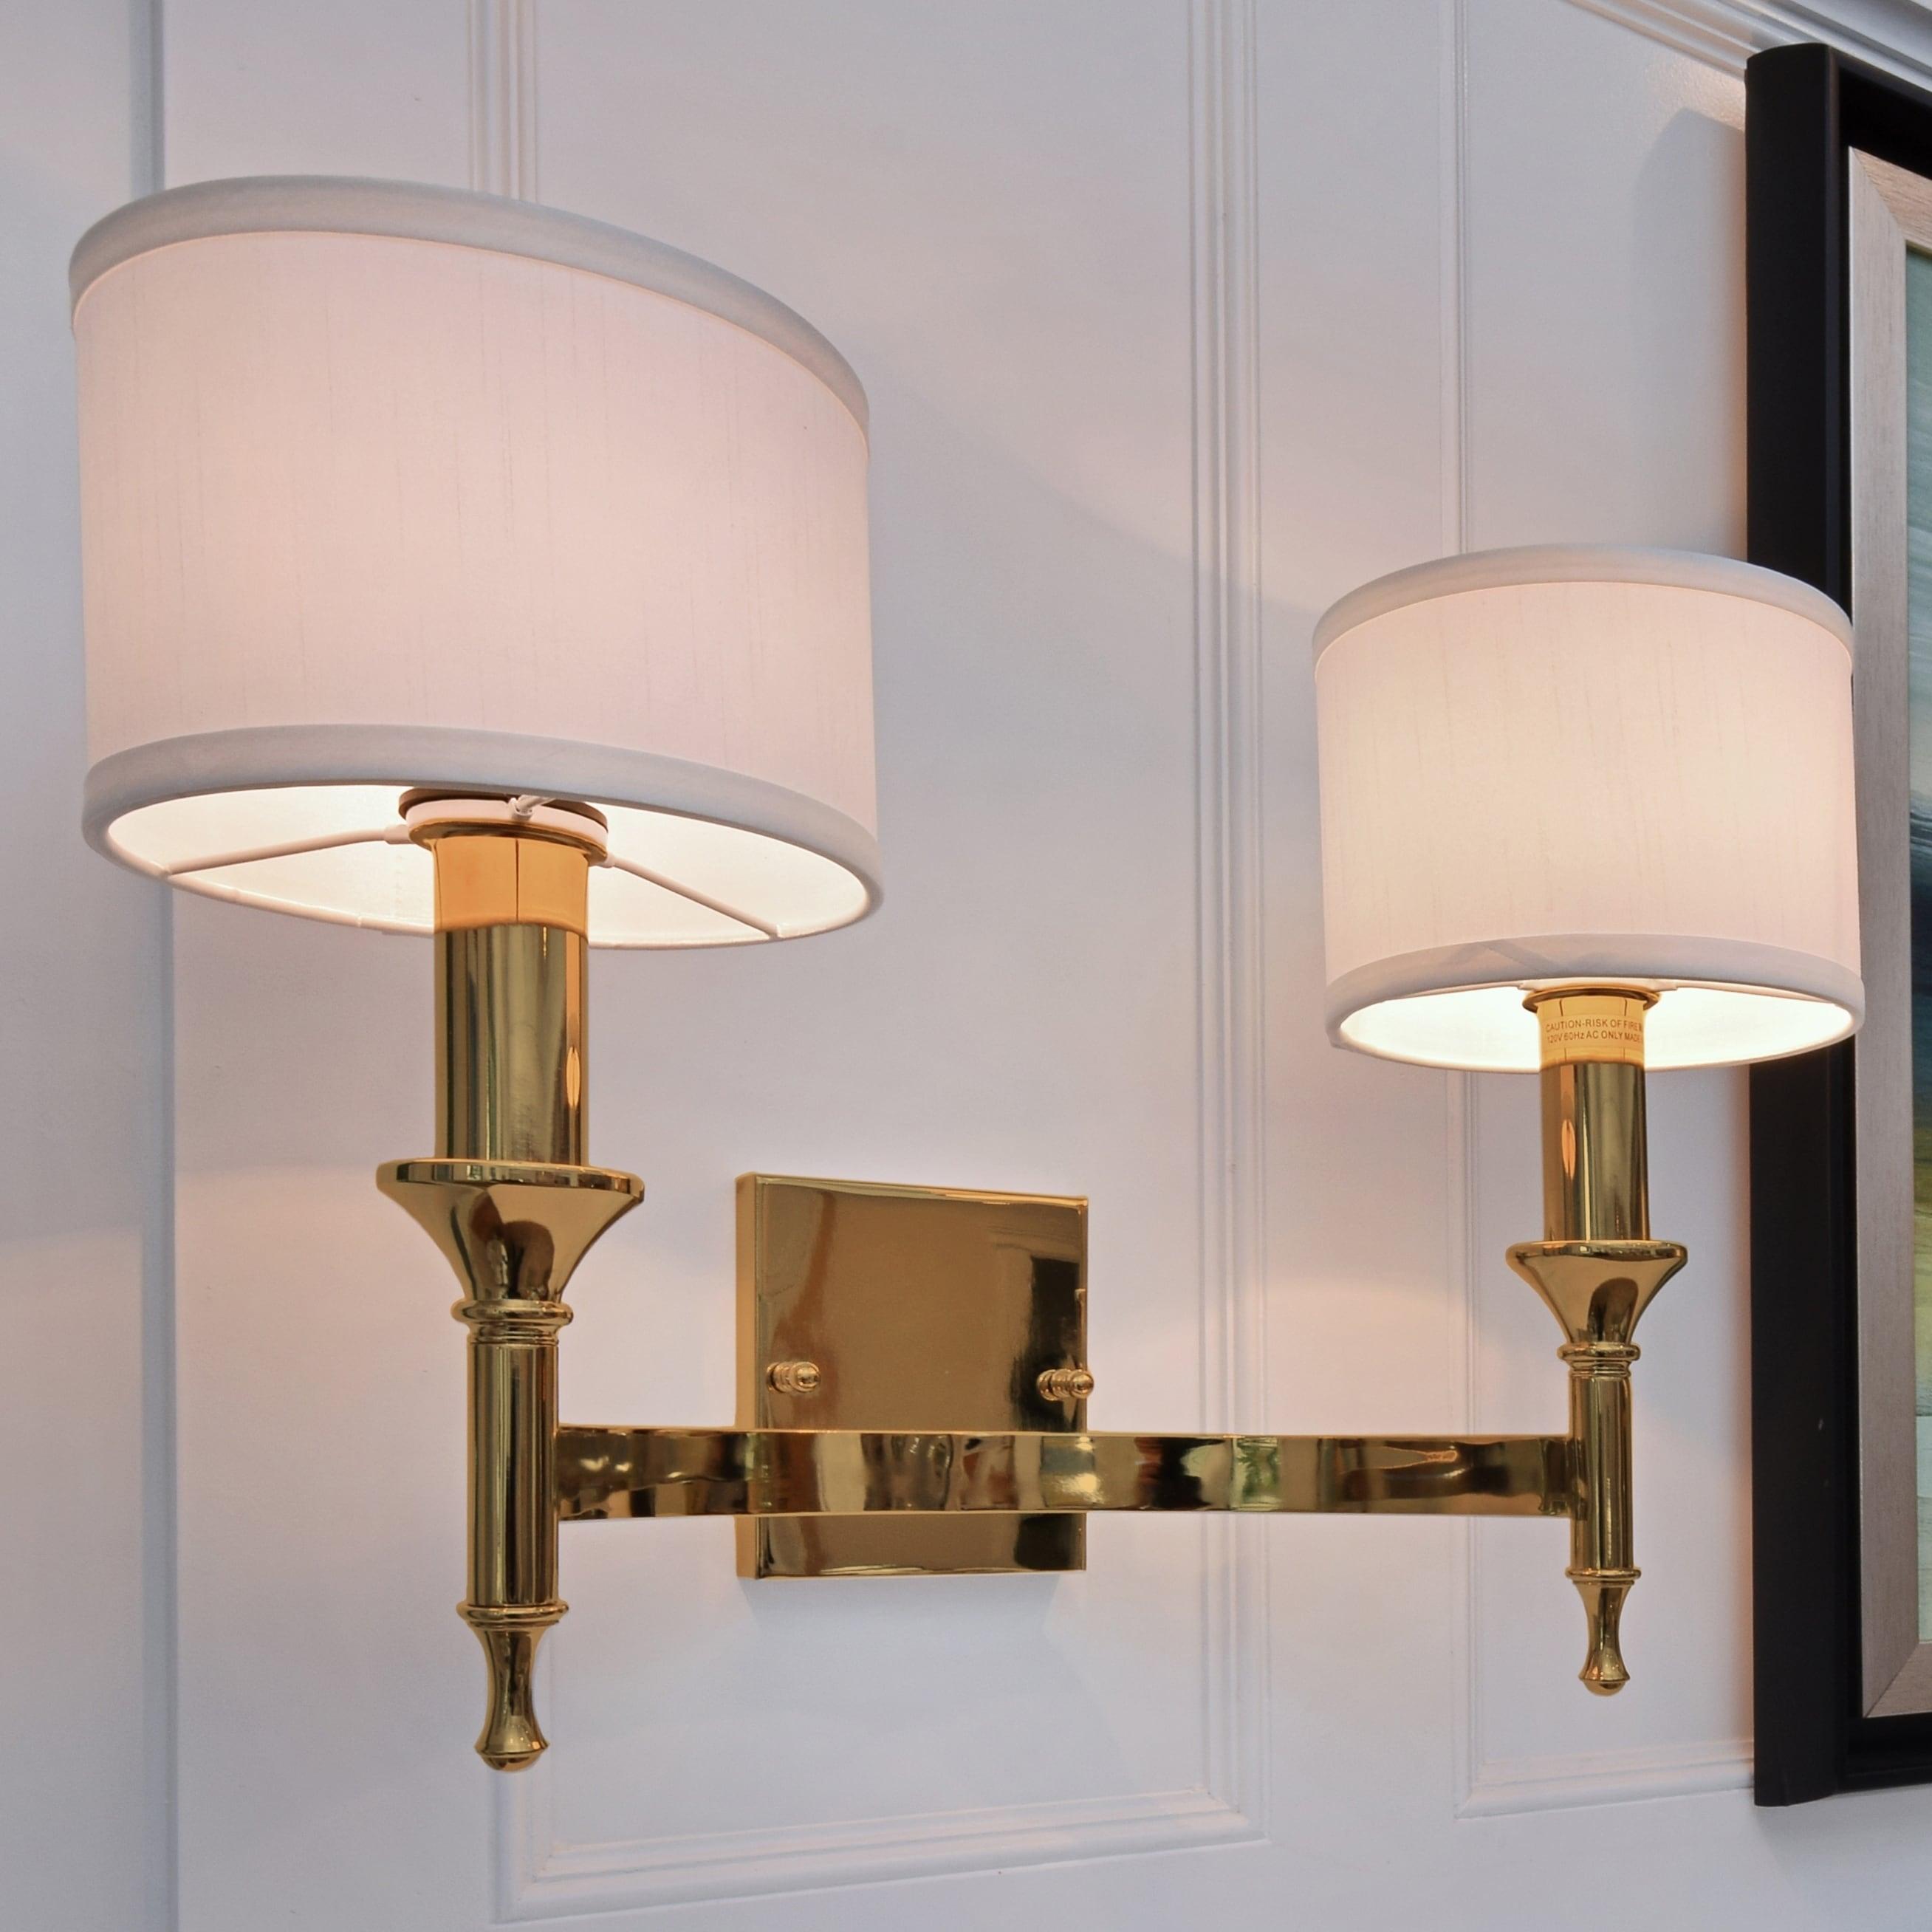 Maxim Lighting Fairmont 2-light Wall Sconce (Natural Aged...